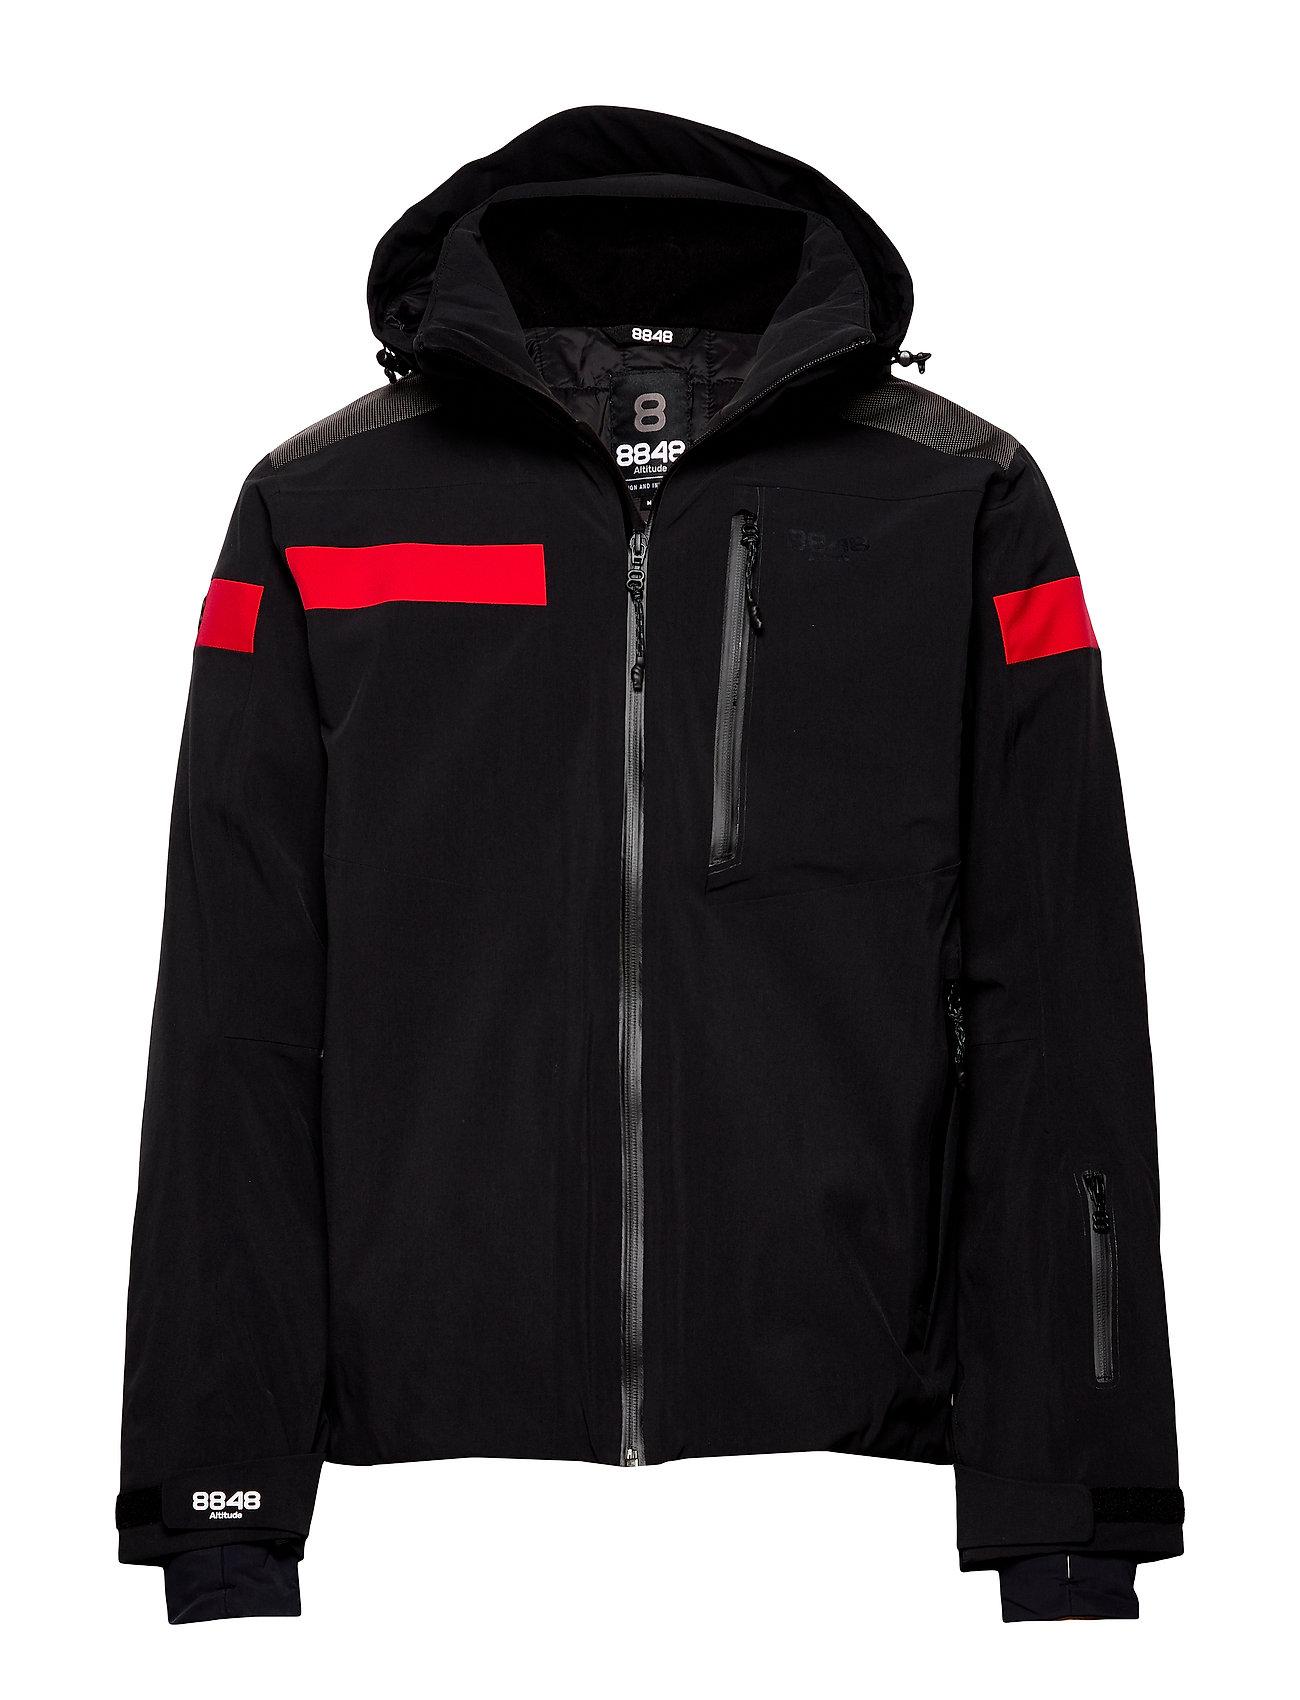 8848 Altitude Aston Jacket - BLACK